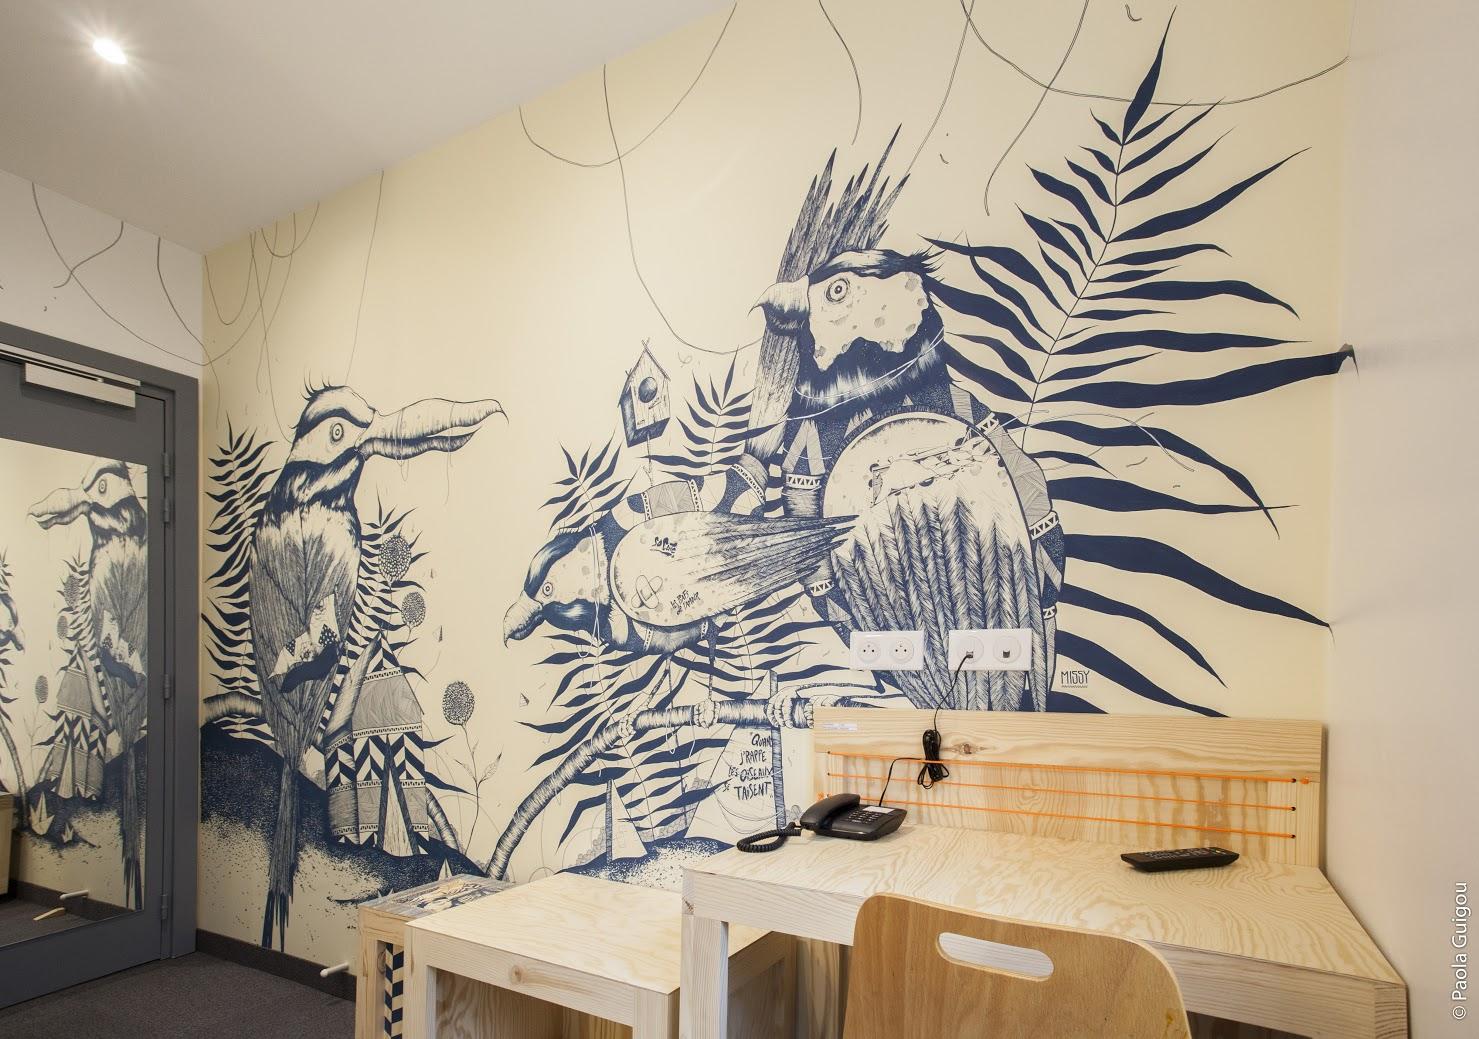 Room 108 by MISSY - (c) Paola Guigou - Graffalgar - 308